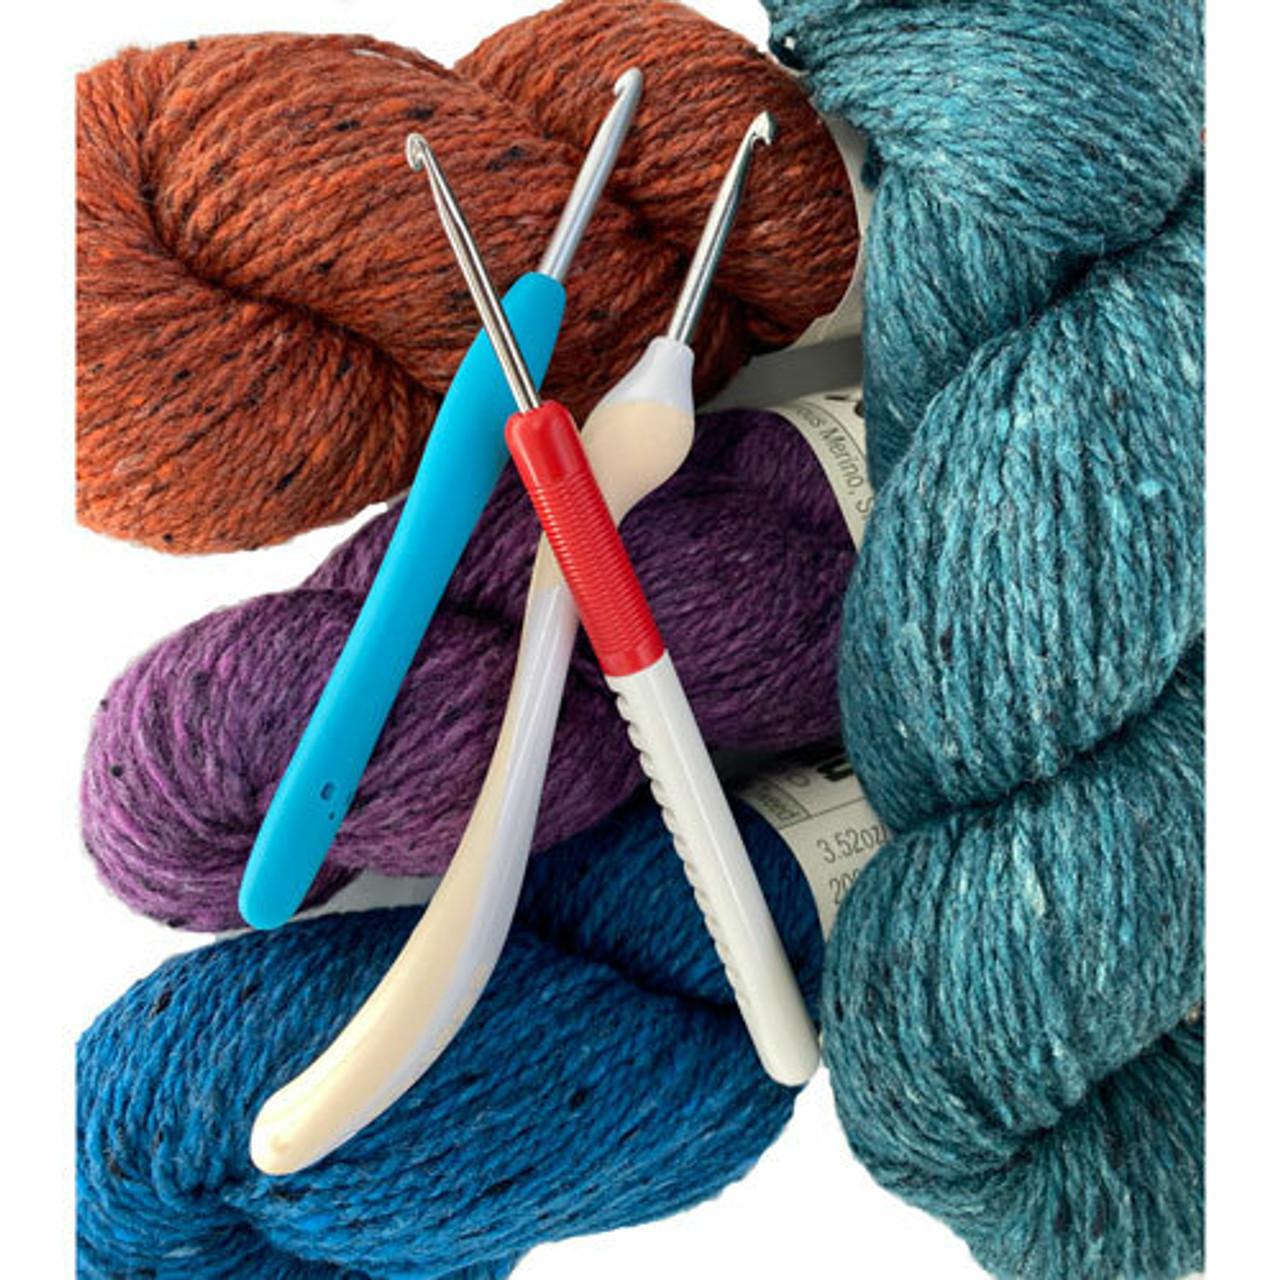 Needles, Hooks and Tools - Crochet - Angelika's Yarn Store